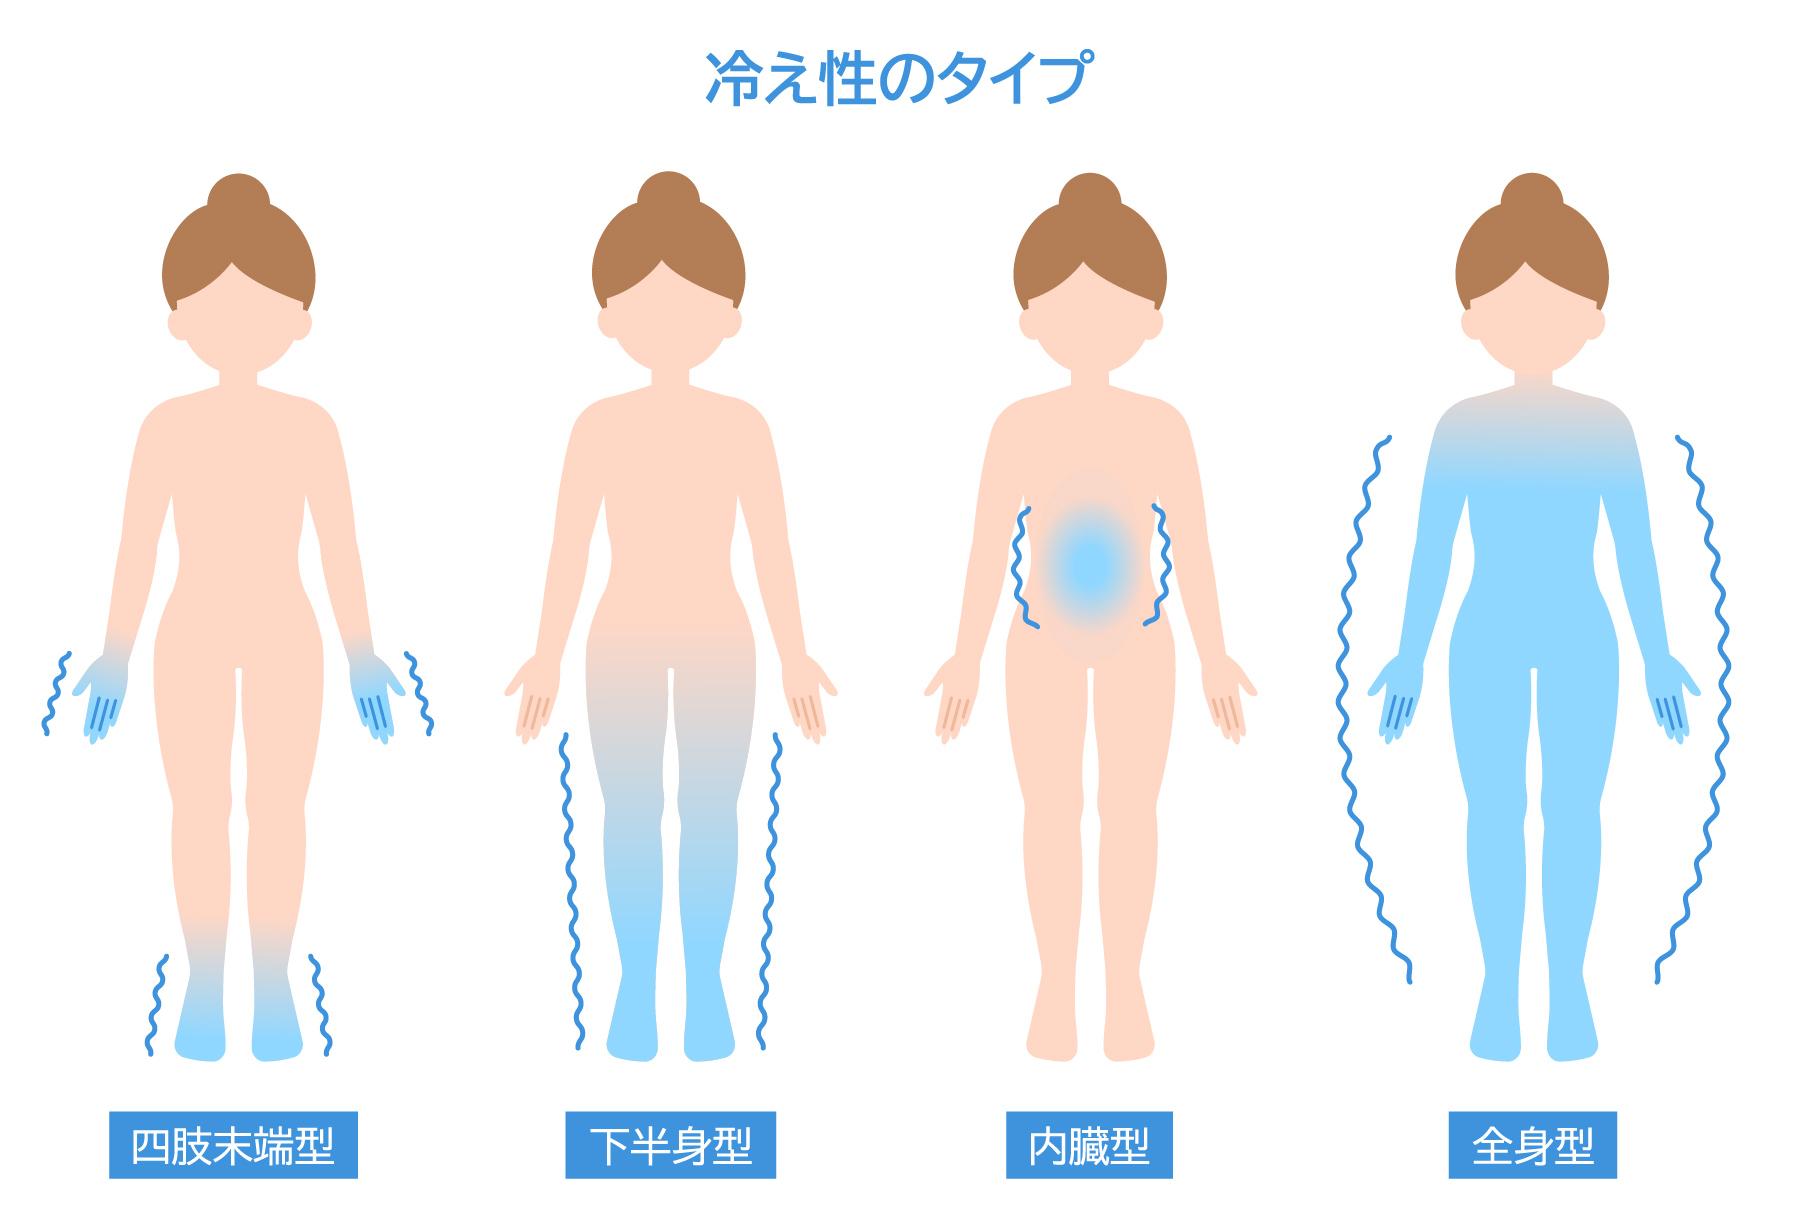 内臓 型 冷え性